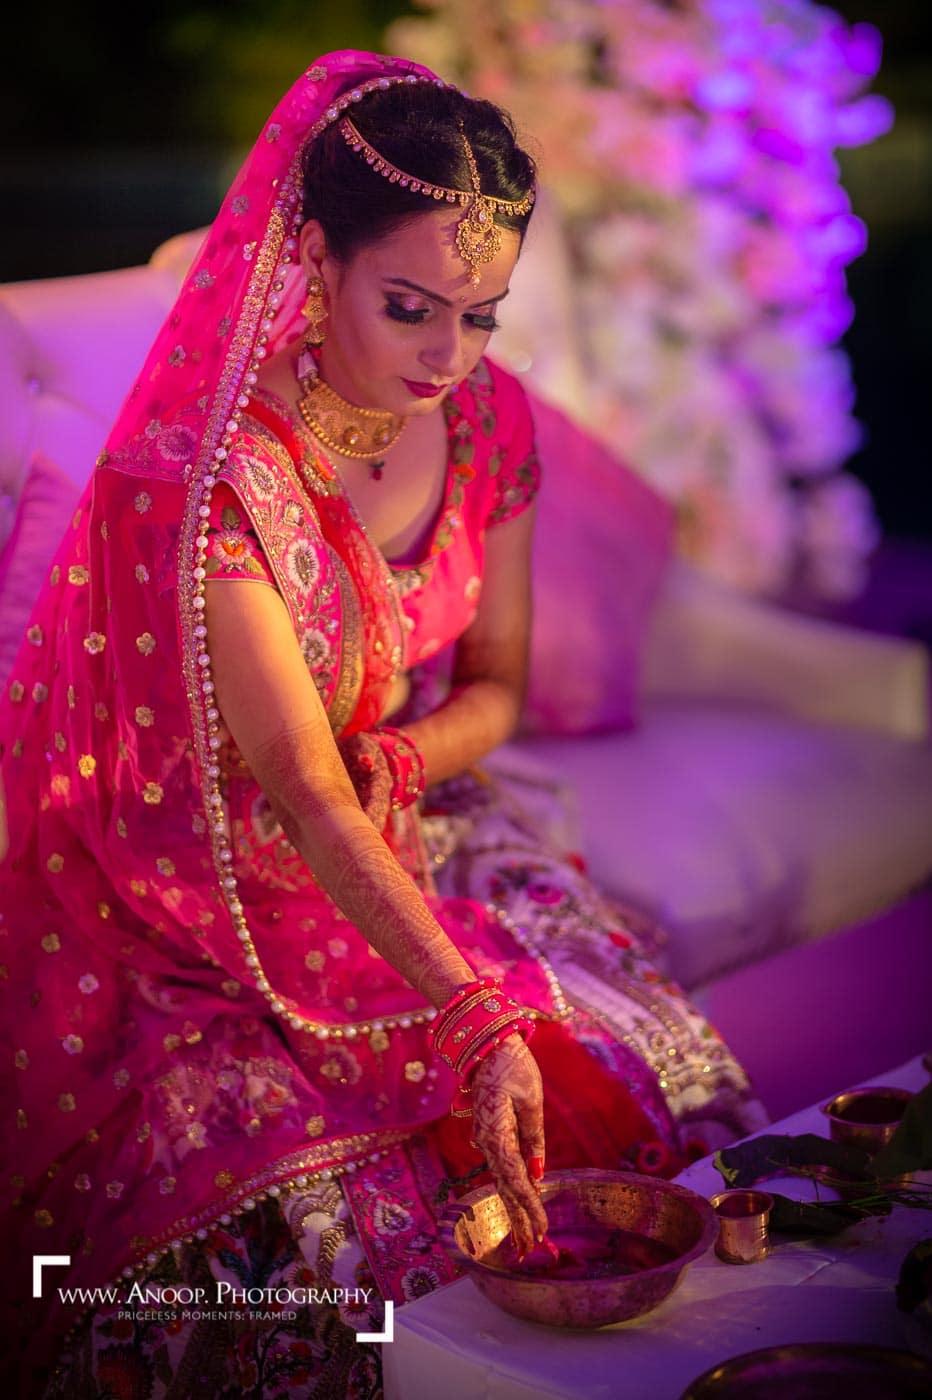 Destination-Nepali-Wedding-in-thailand-sheraton-hua-hin-015